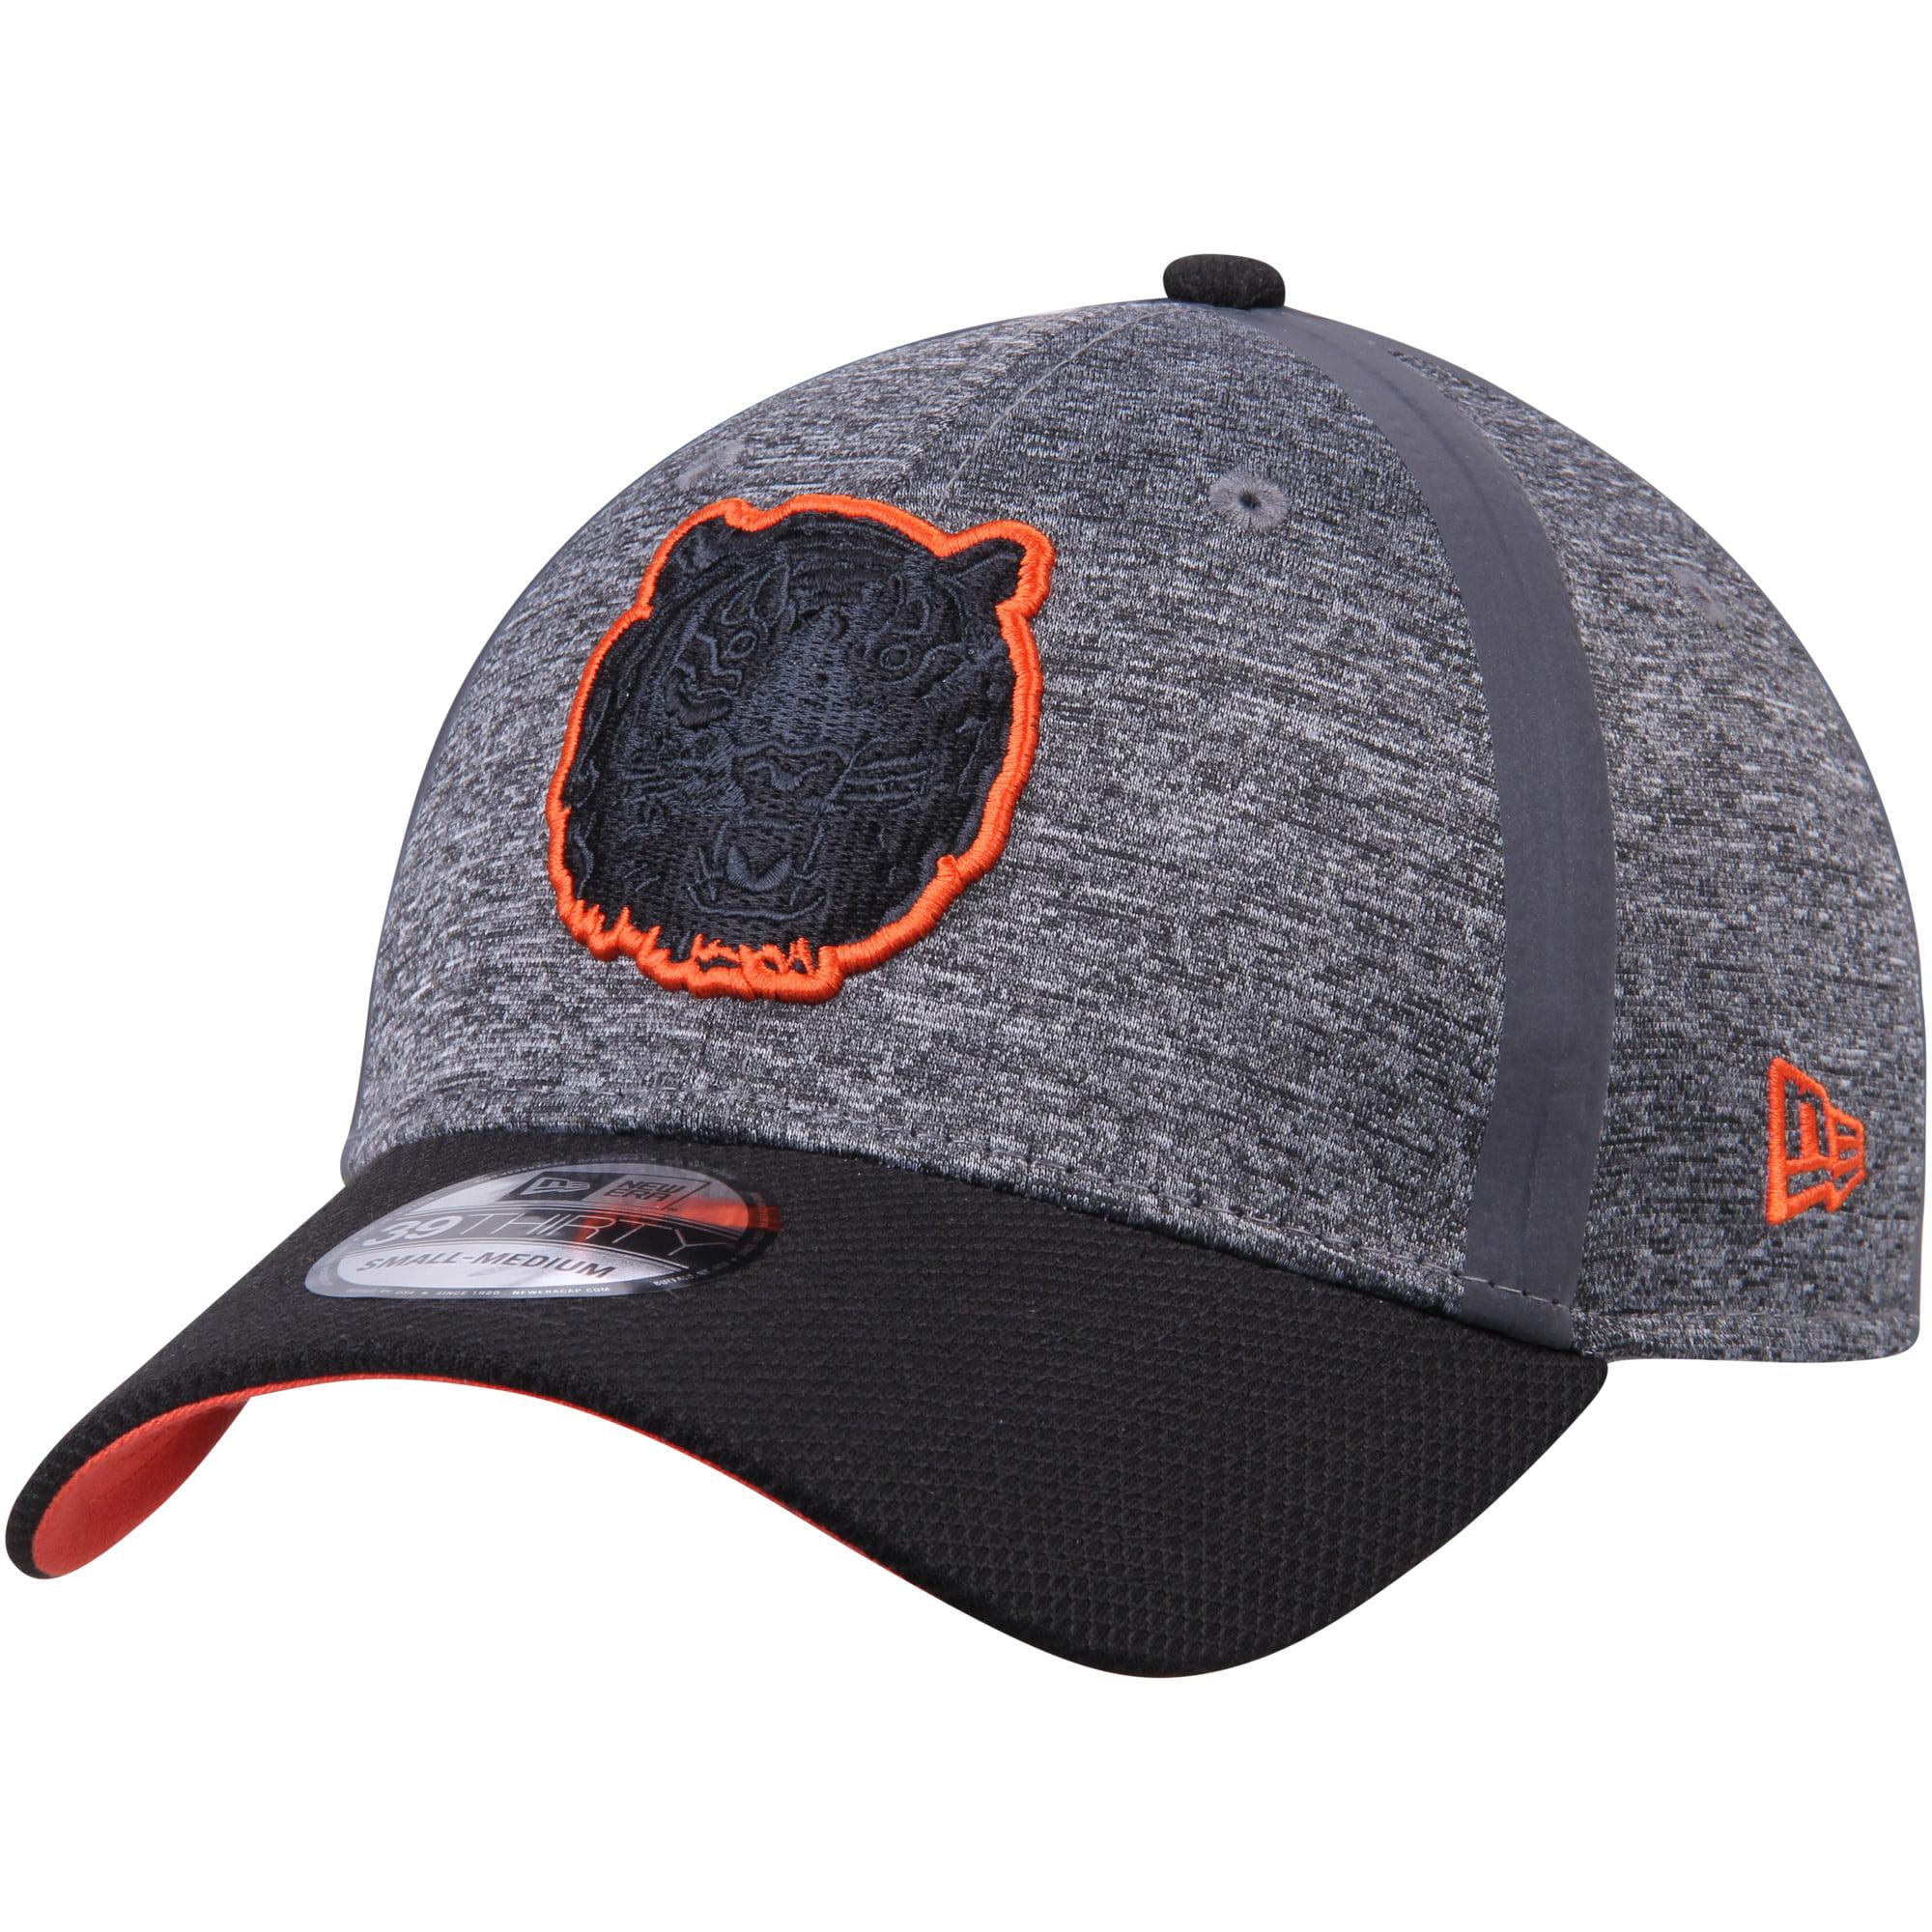 Detroit Tigers New Era Clubhouse 39THIRTY Flex Hat - Heathered Gray/Black